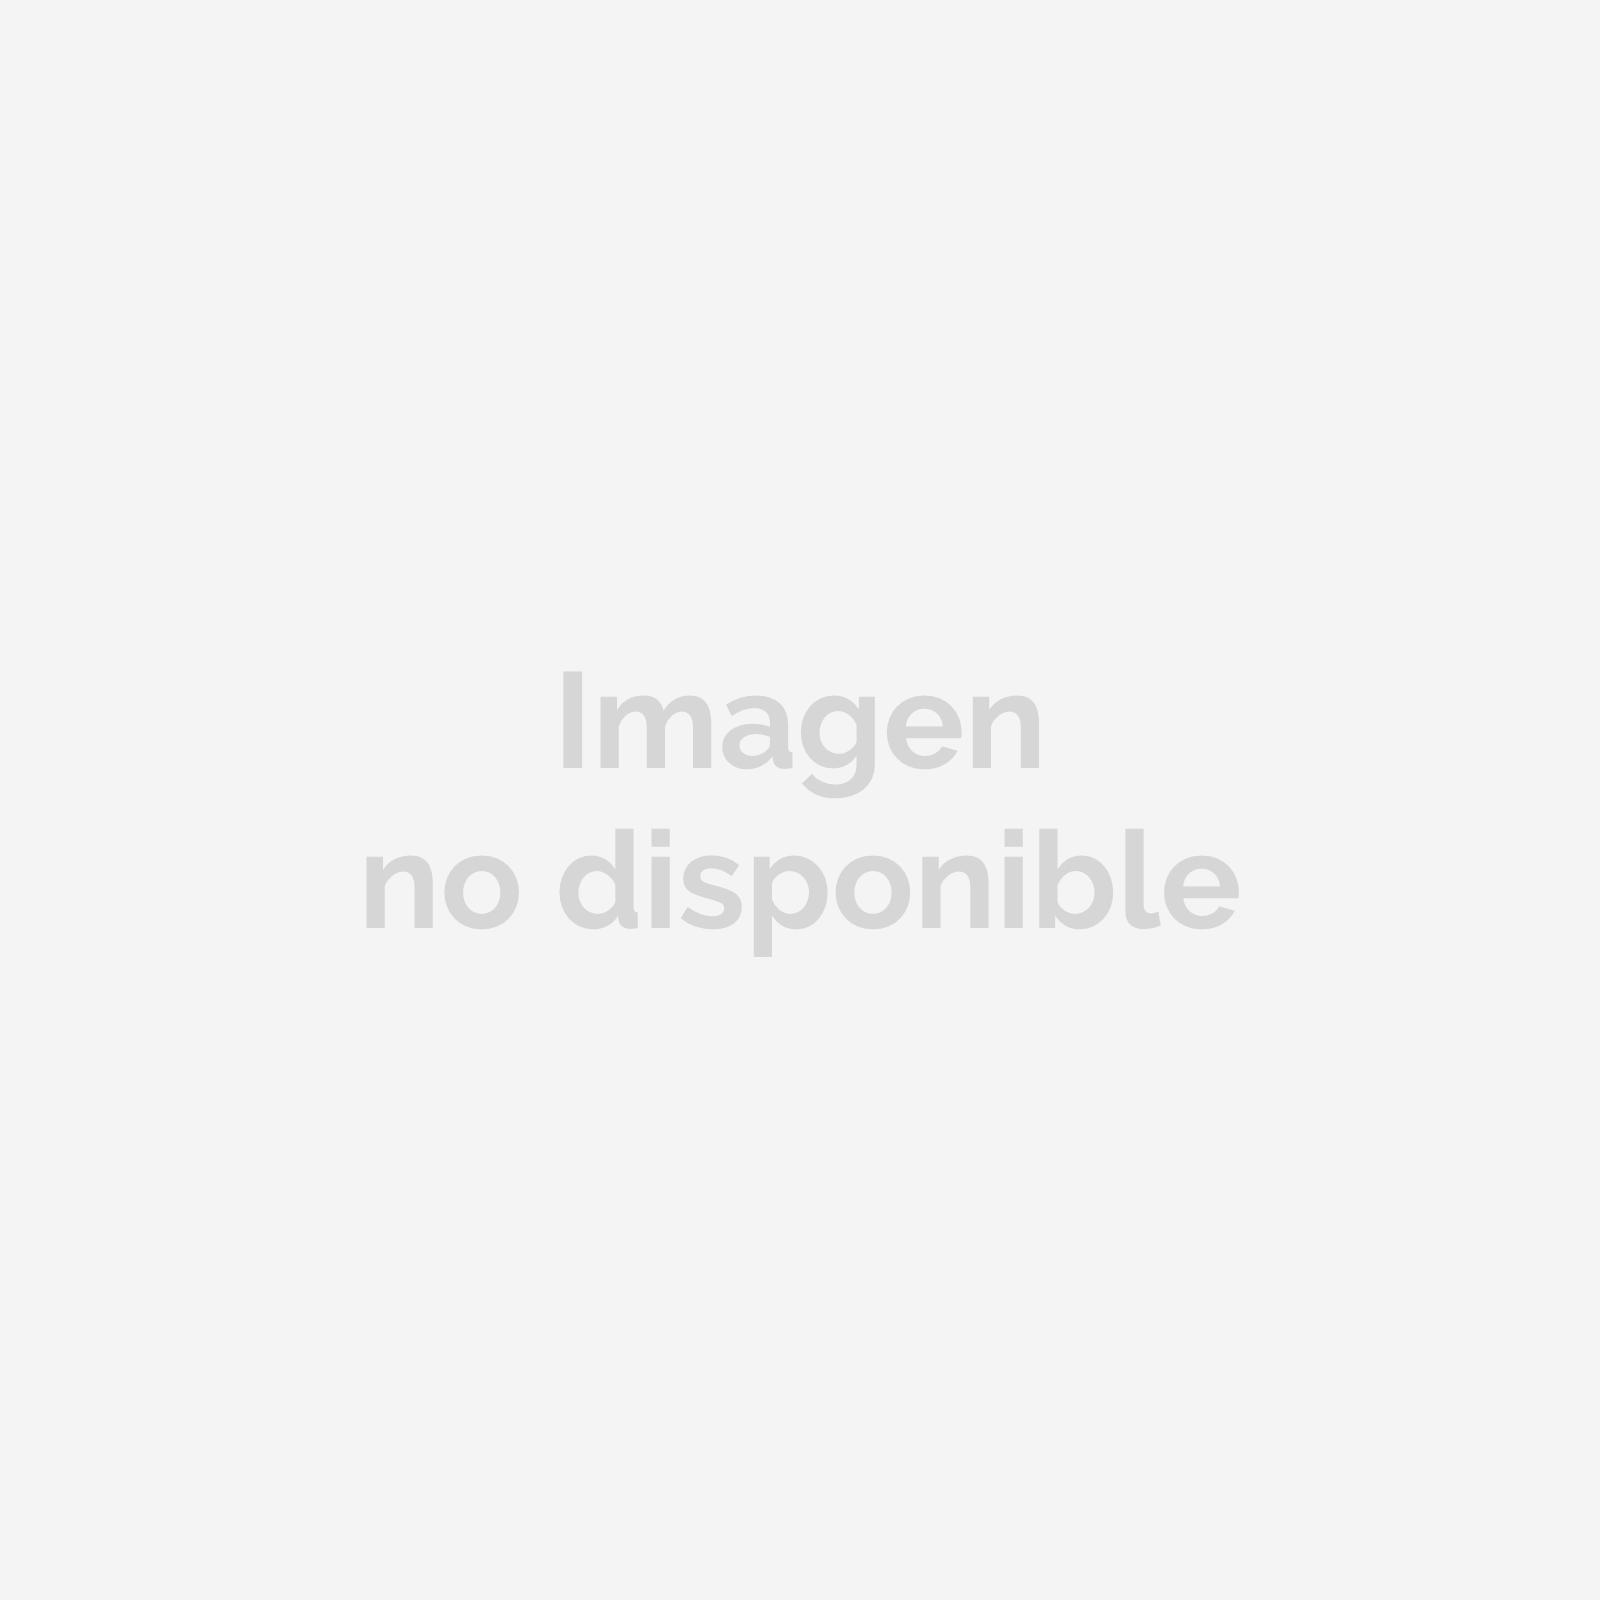 Conair Kit Recortadora HC108RGB